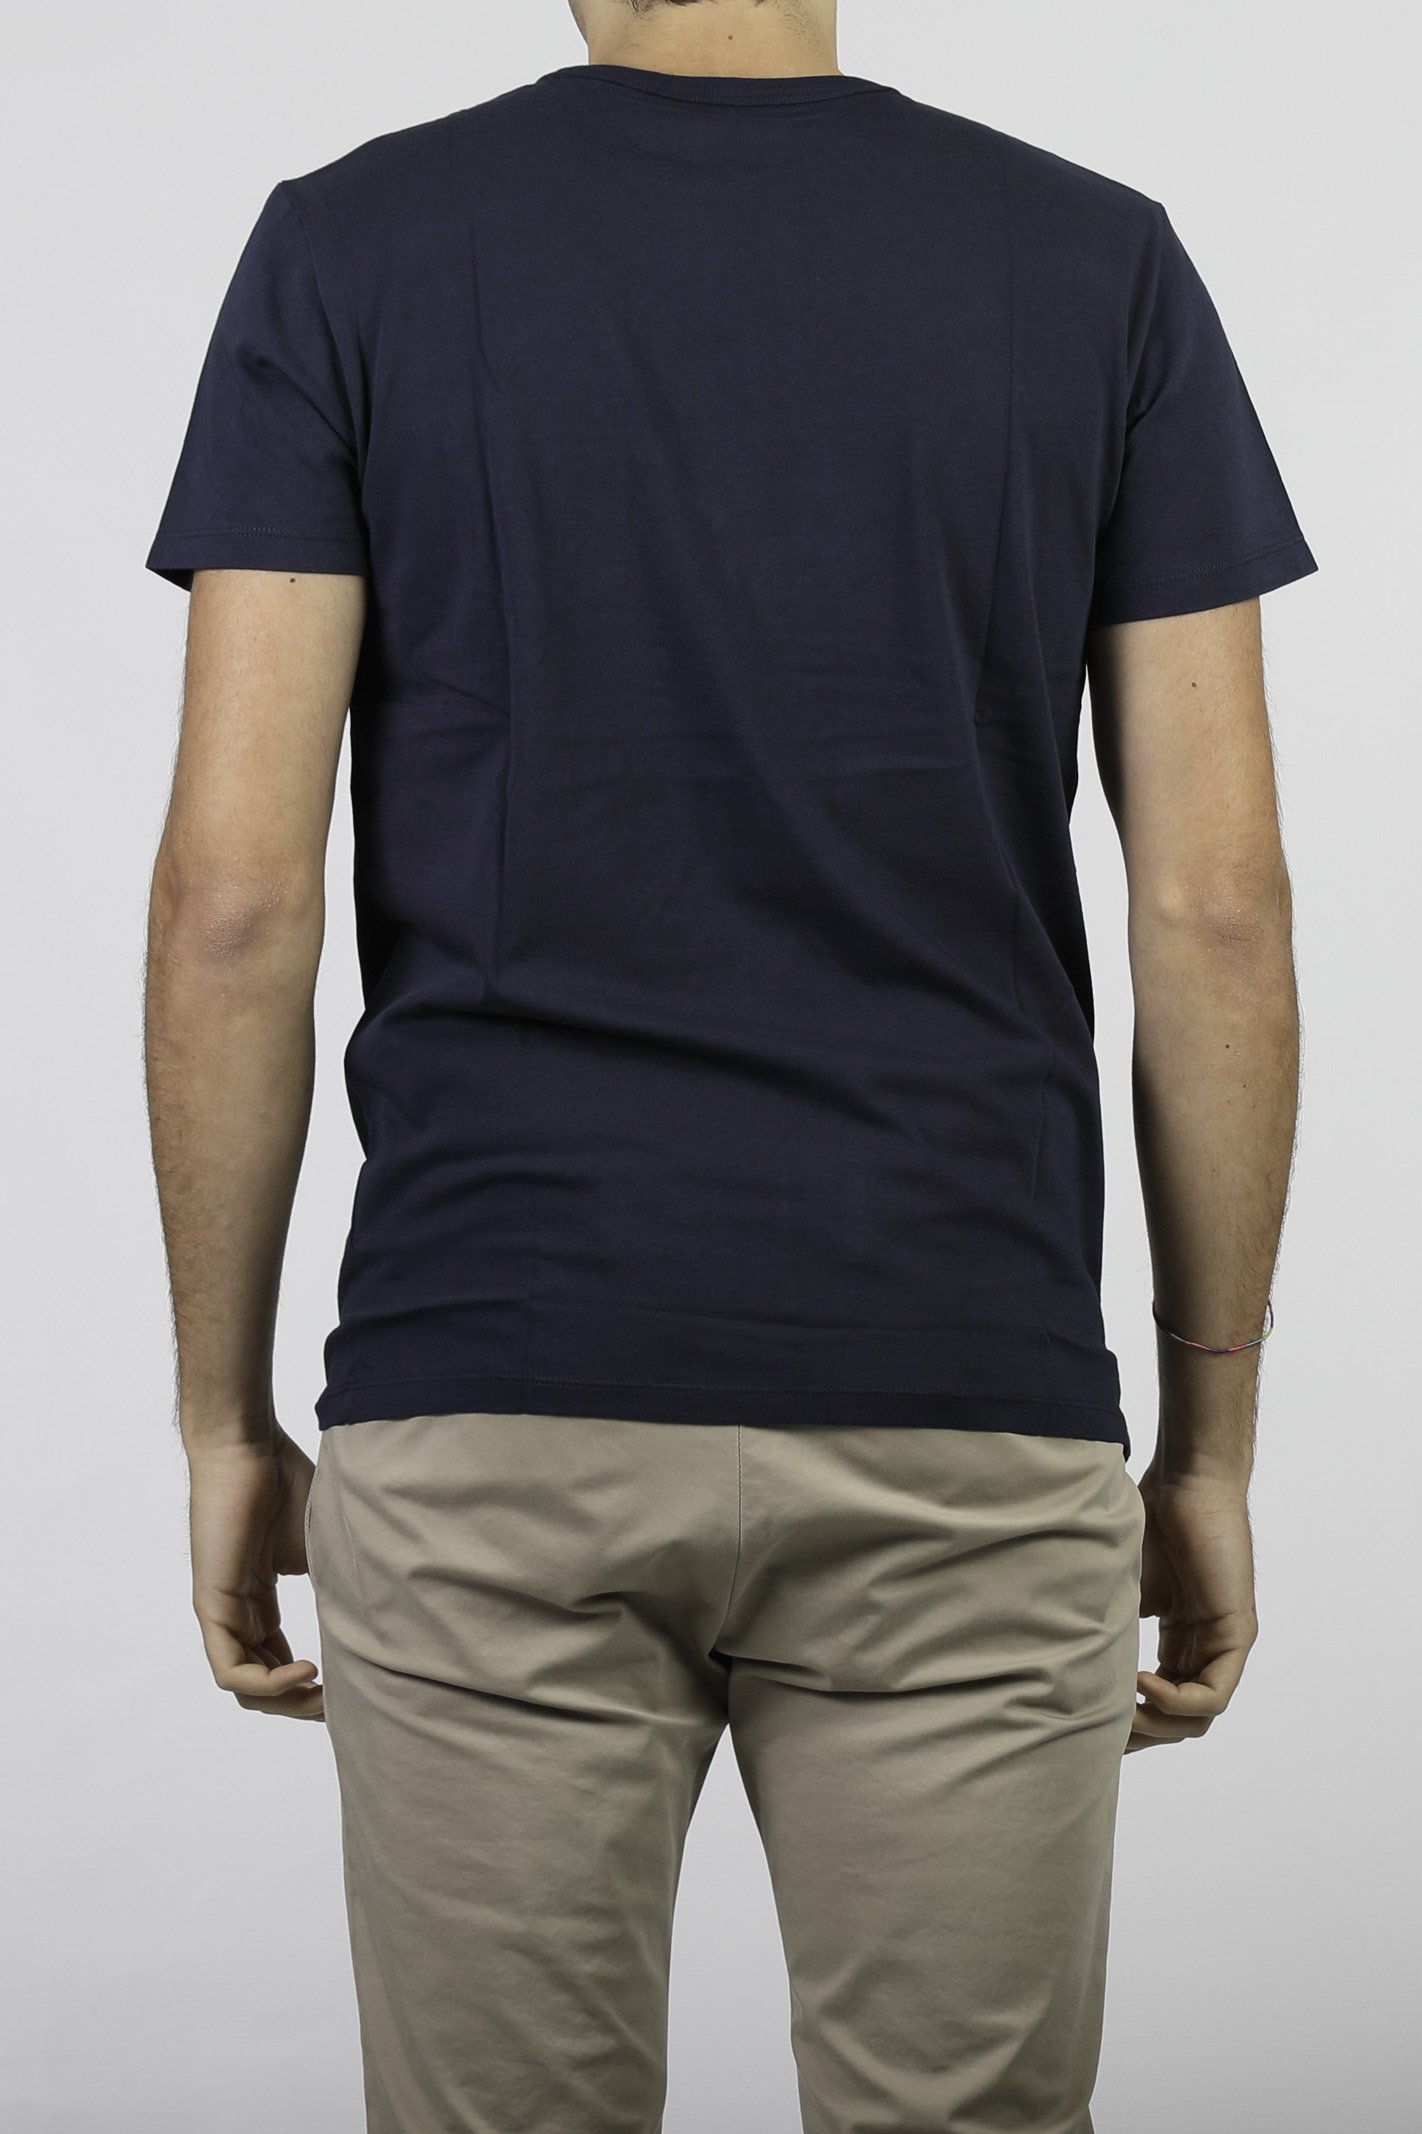 T-SHIRT IN COTONE SUN 68   T-shirt   T3110107